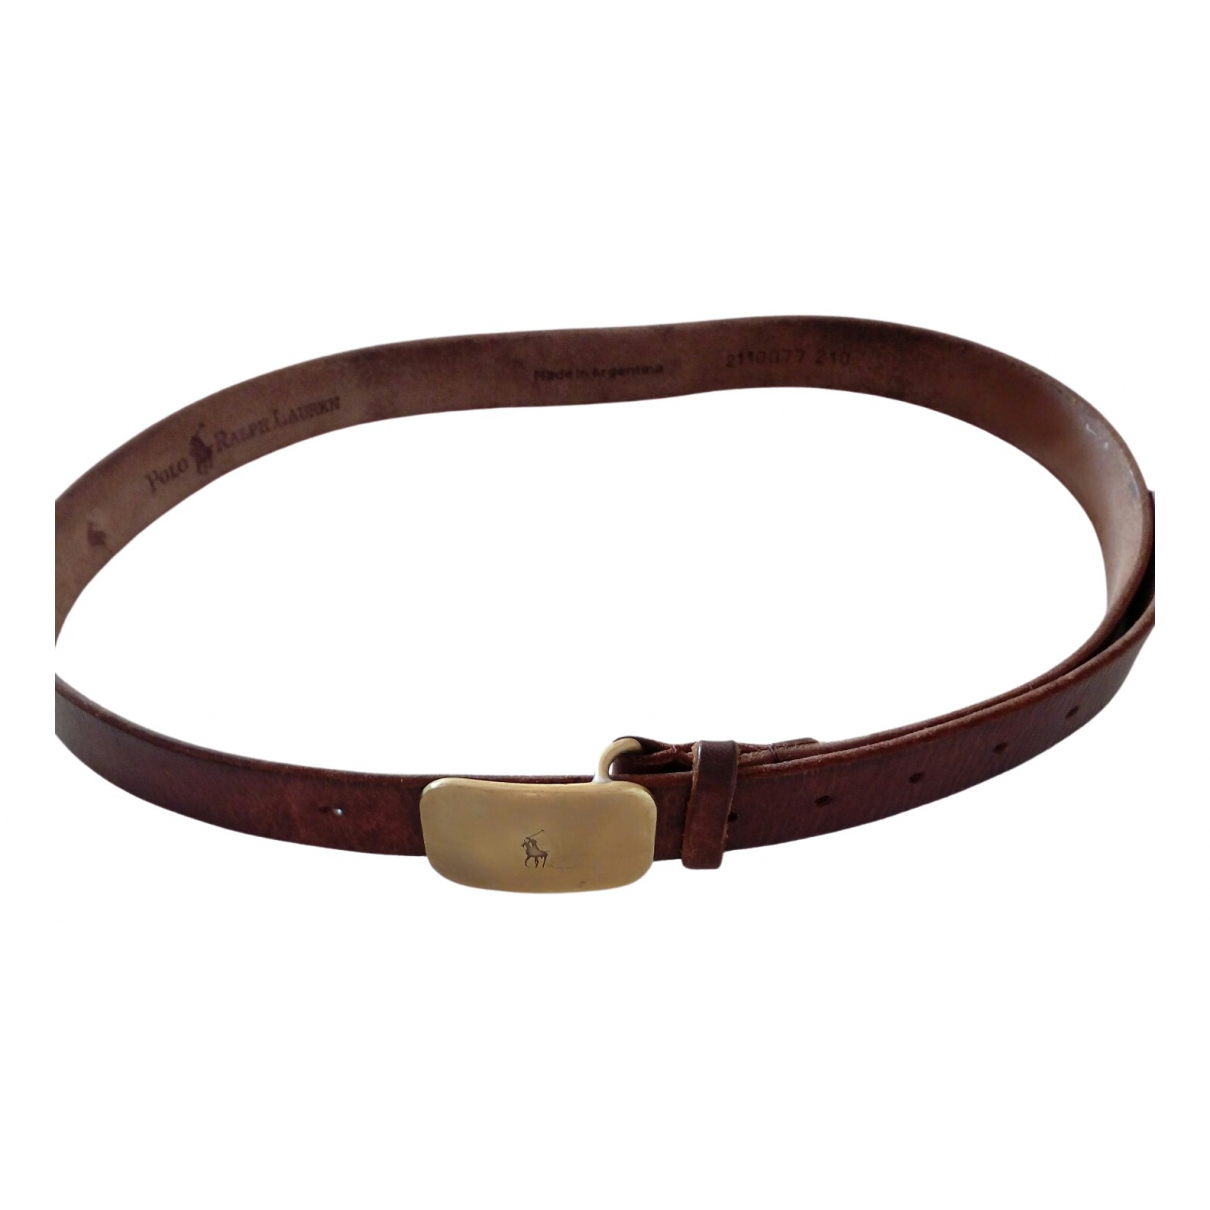 Polo Ralph Lauren \N Brown Leather belt for Men M international